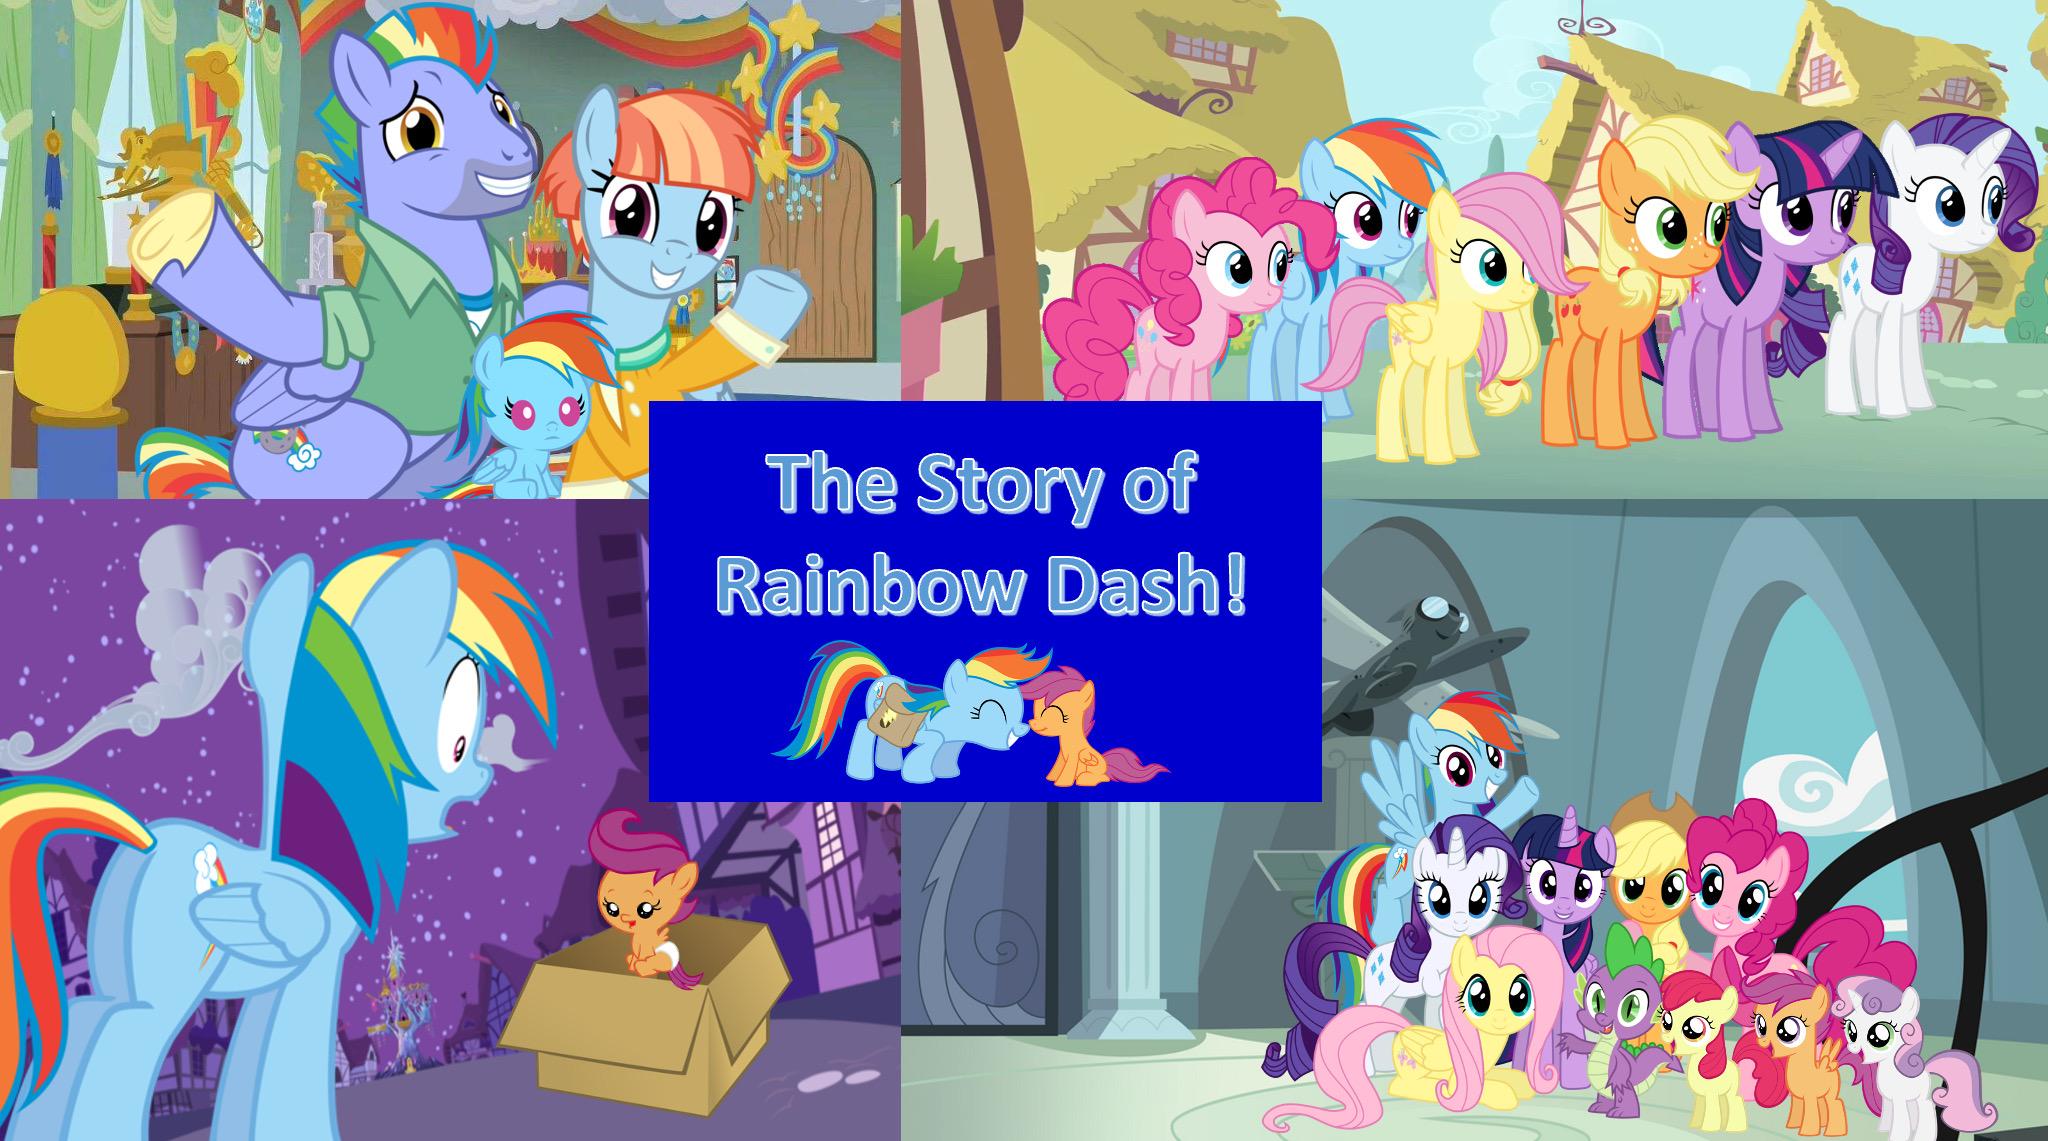 The Story Of Rainbow Dash By Darkmoonanimation On Deviantart Scootaloo wild rainbow style : the story of rainbow dash by